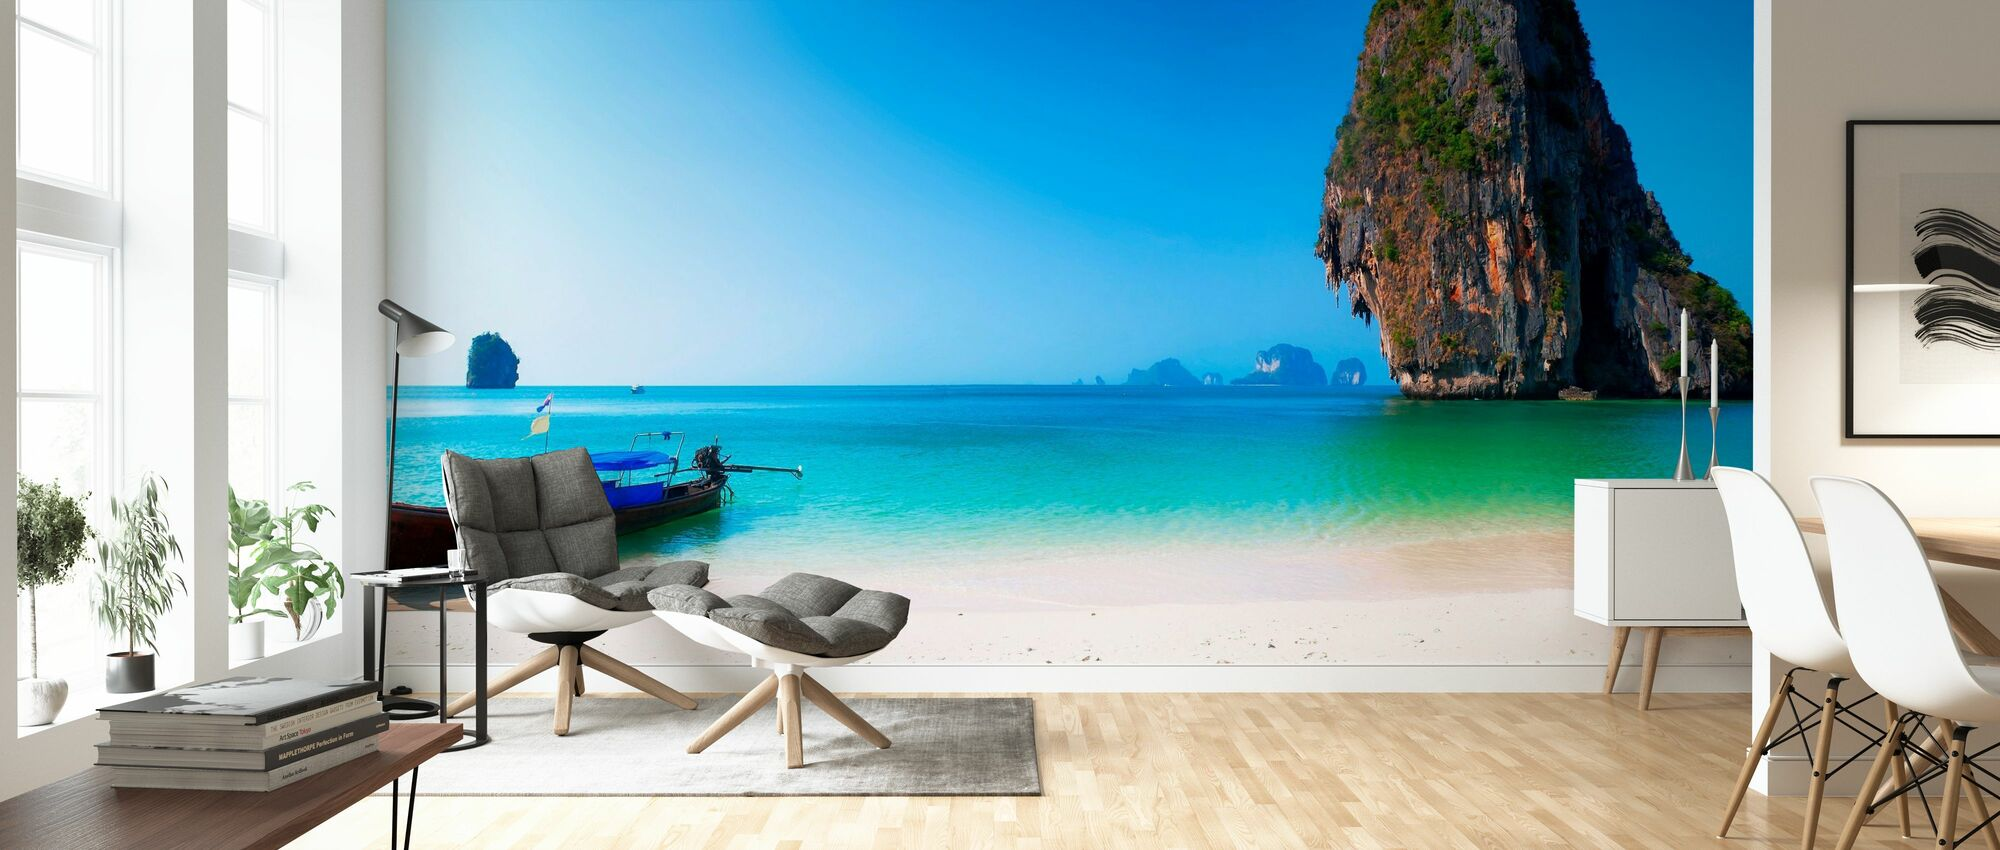 Thailand Island Beach - Carta da parati - Salotto